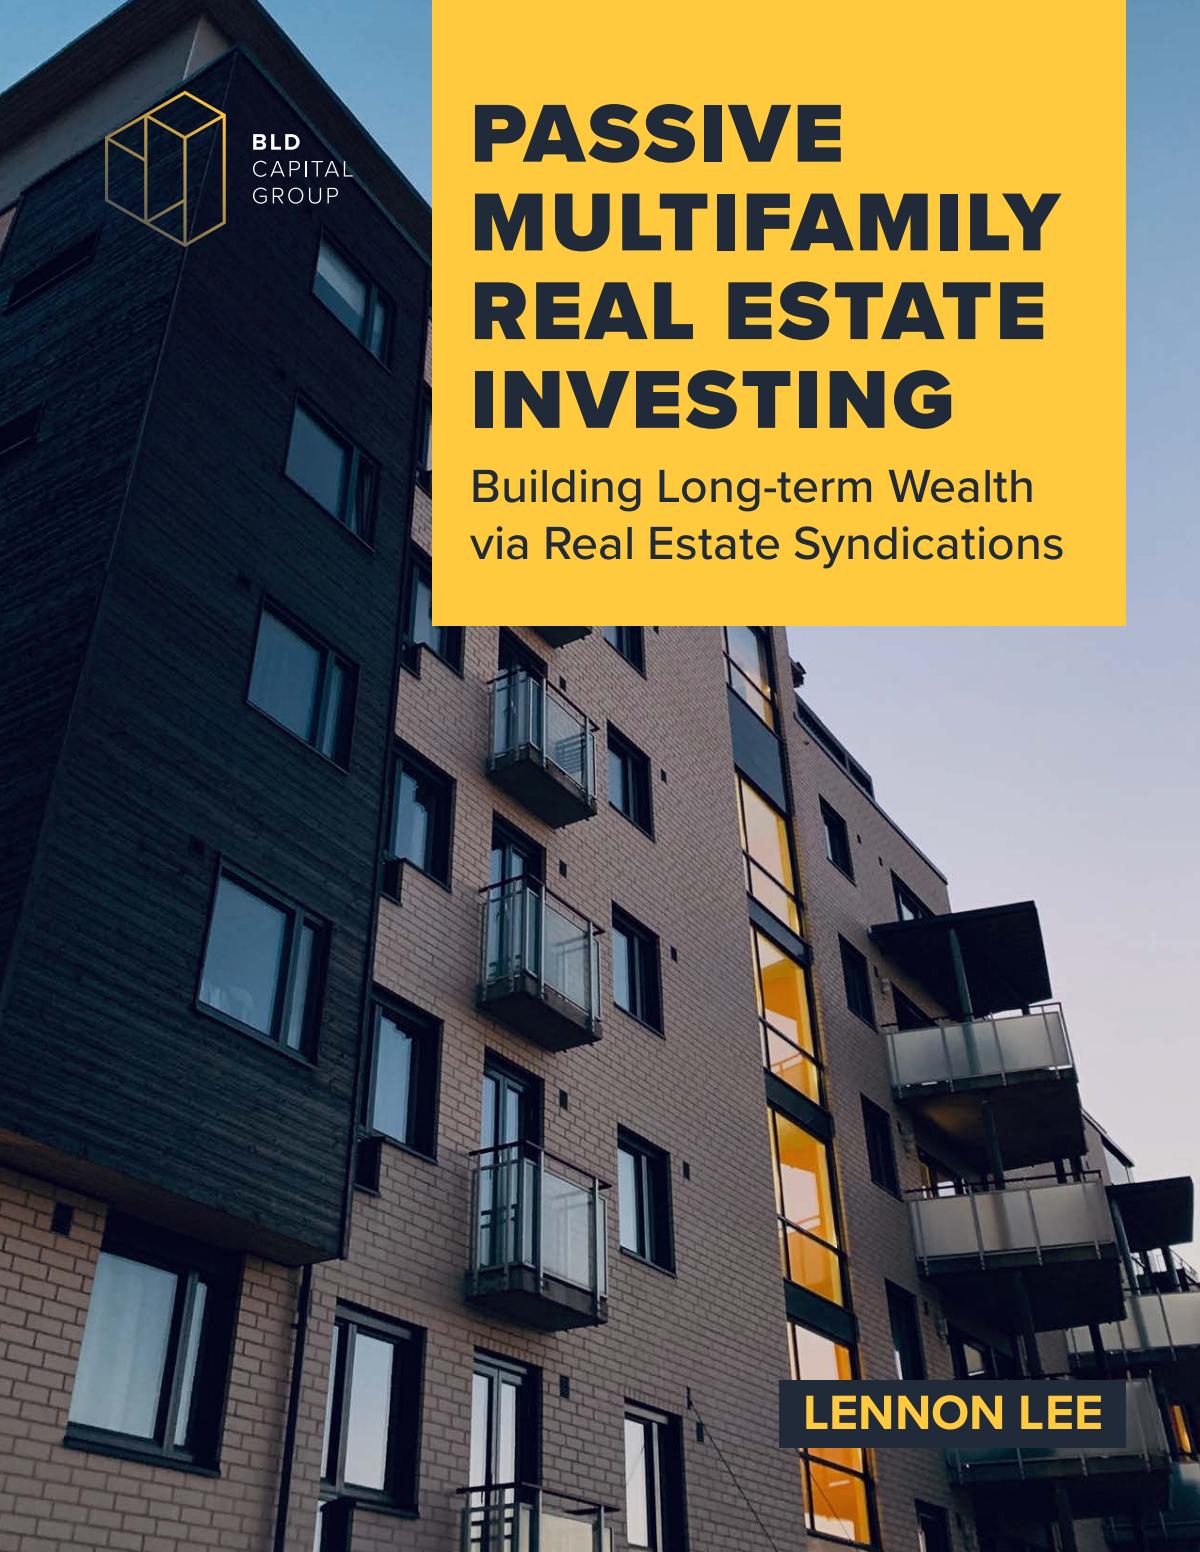 Interior book layout/design for Real Estate Investing E-book